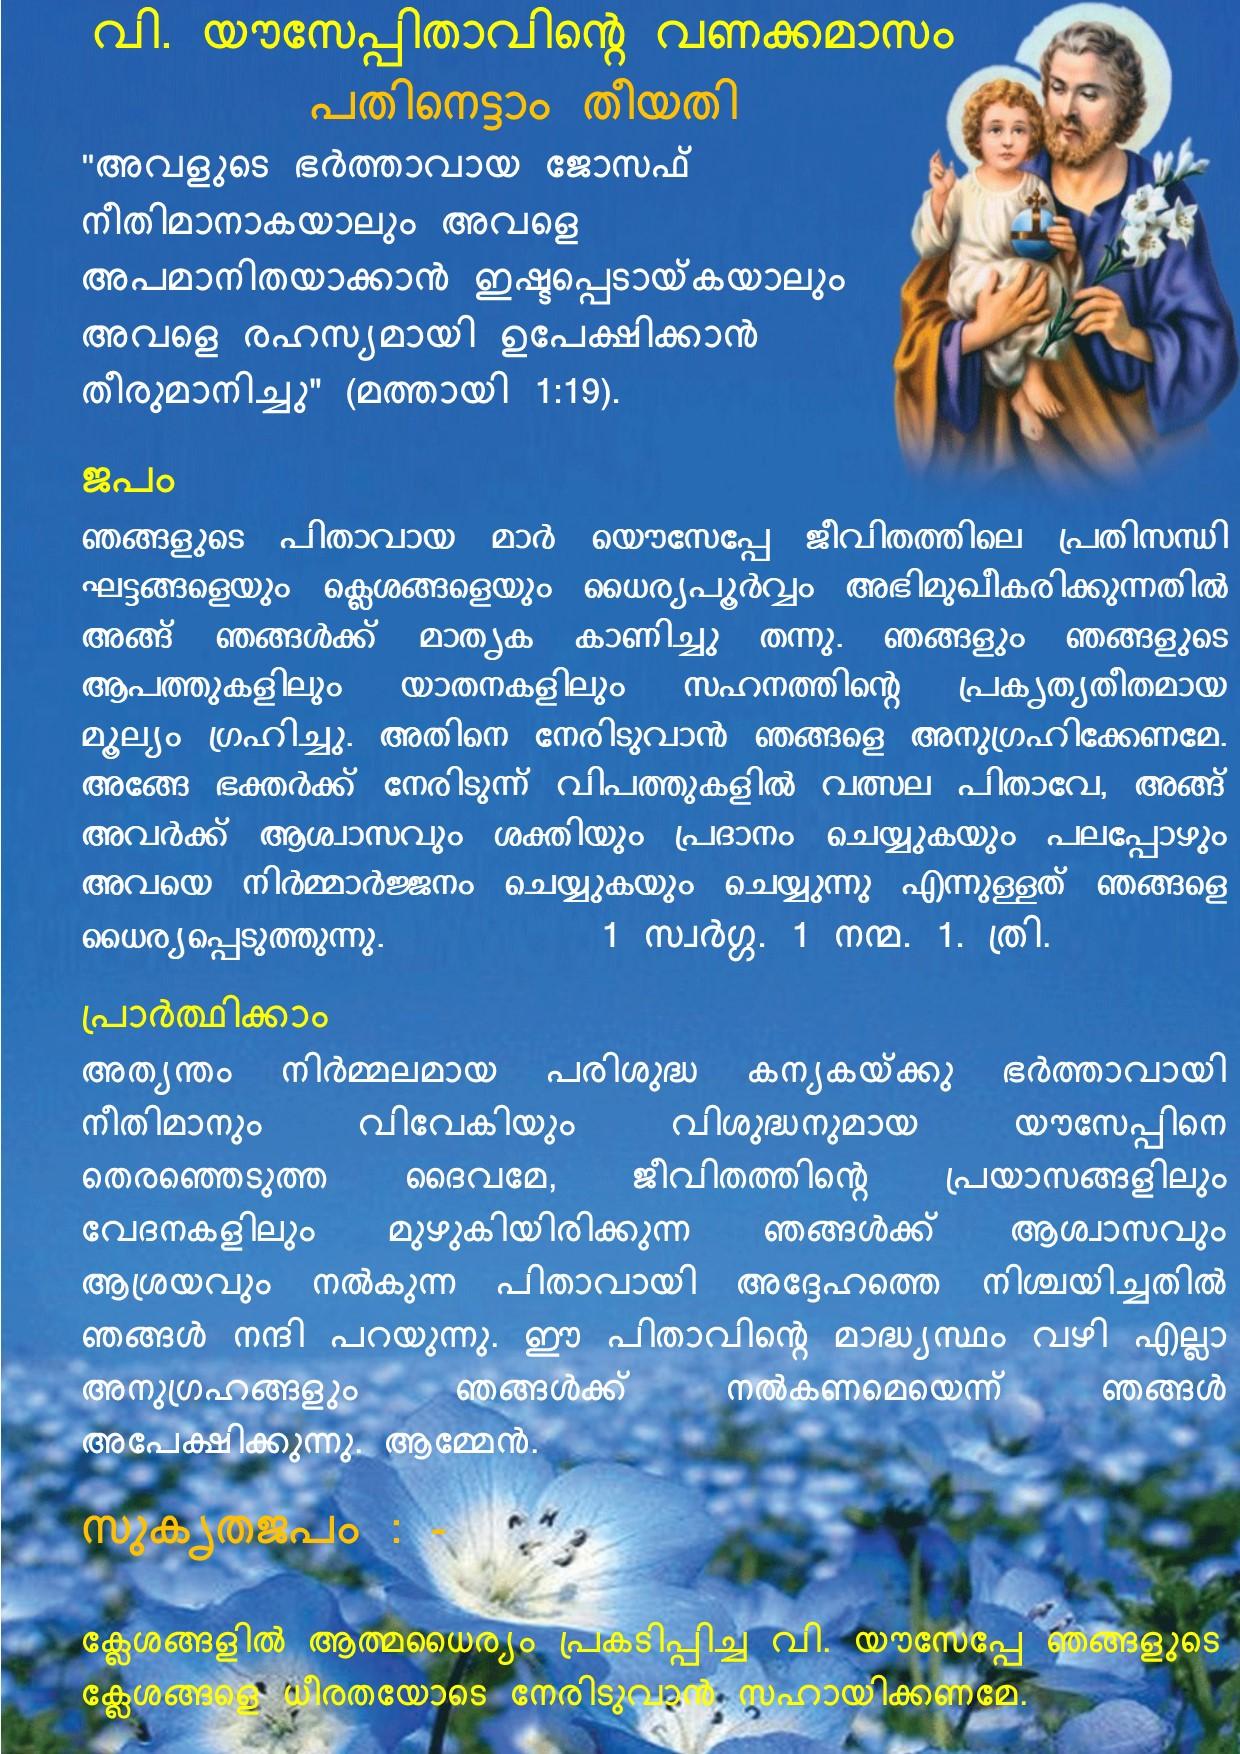 Vanakkamasam, St Joseph, March 18